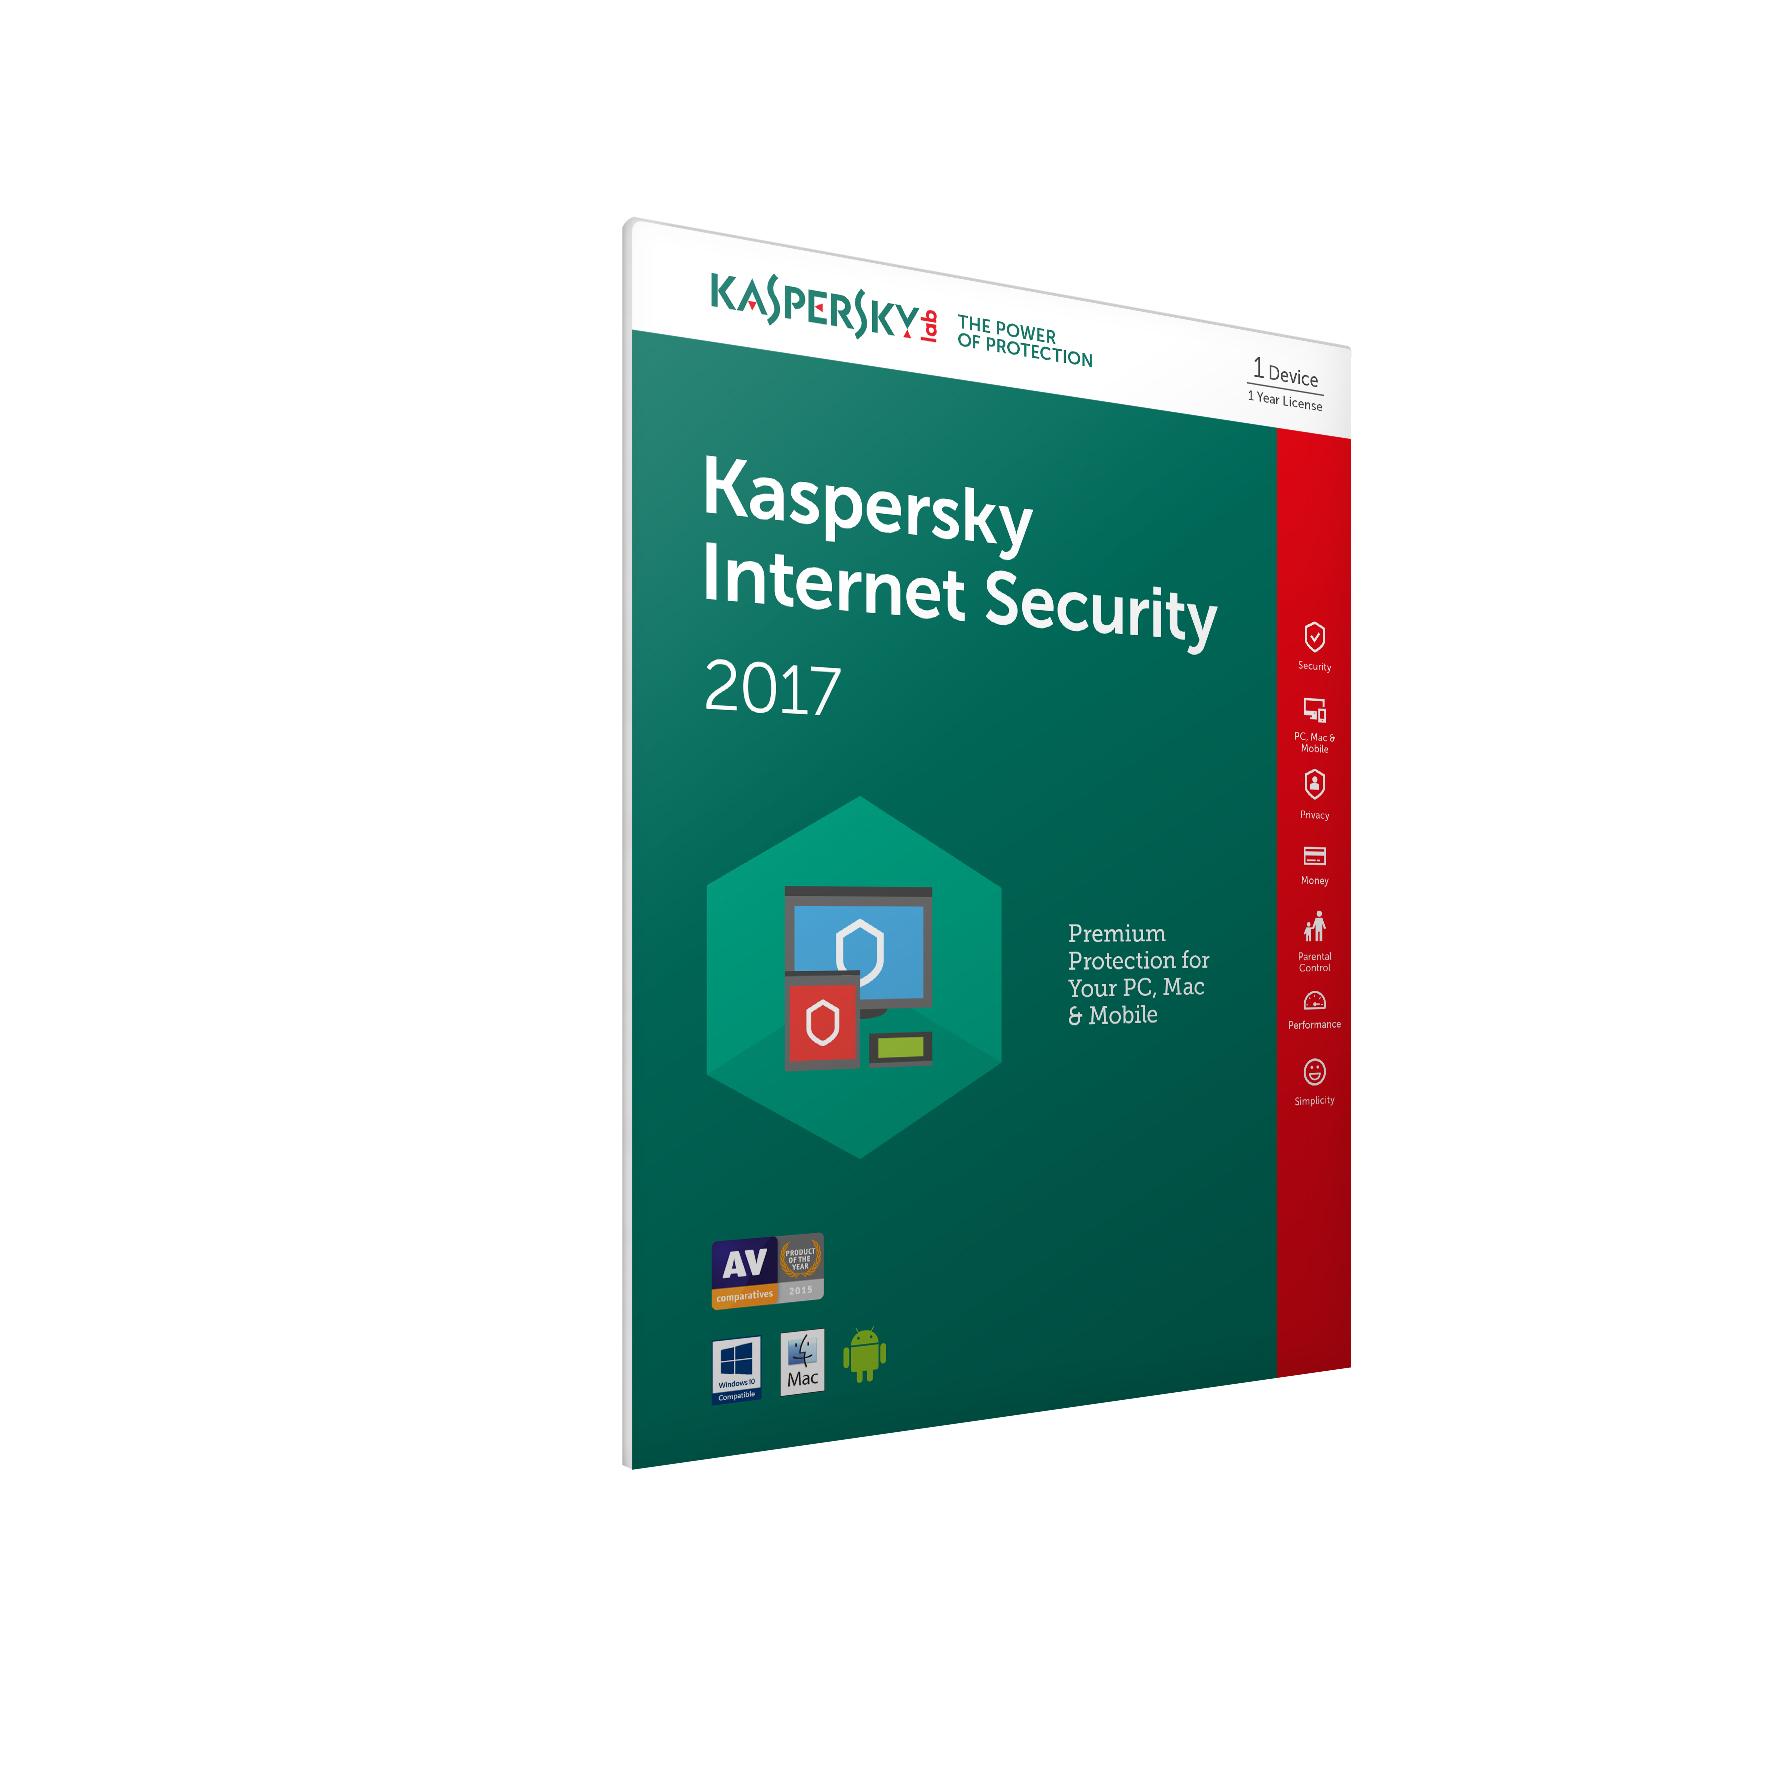 Kaspersky Lab Kaspersky Internet Security 2017 - 1 Devices 1 Year (Frustration Free Packaging)